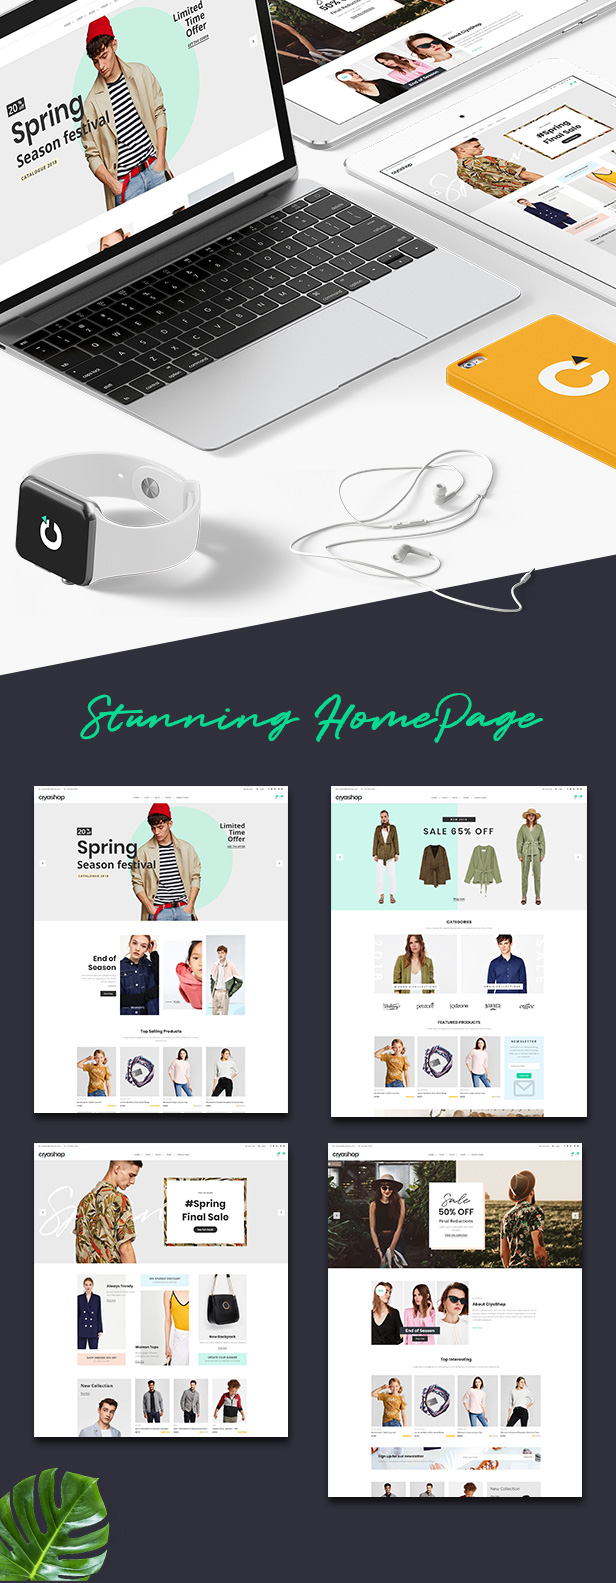 CiyaShop - Multi-Purpose eCommerce React Template - 7